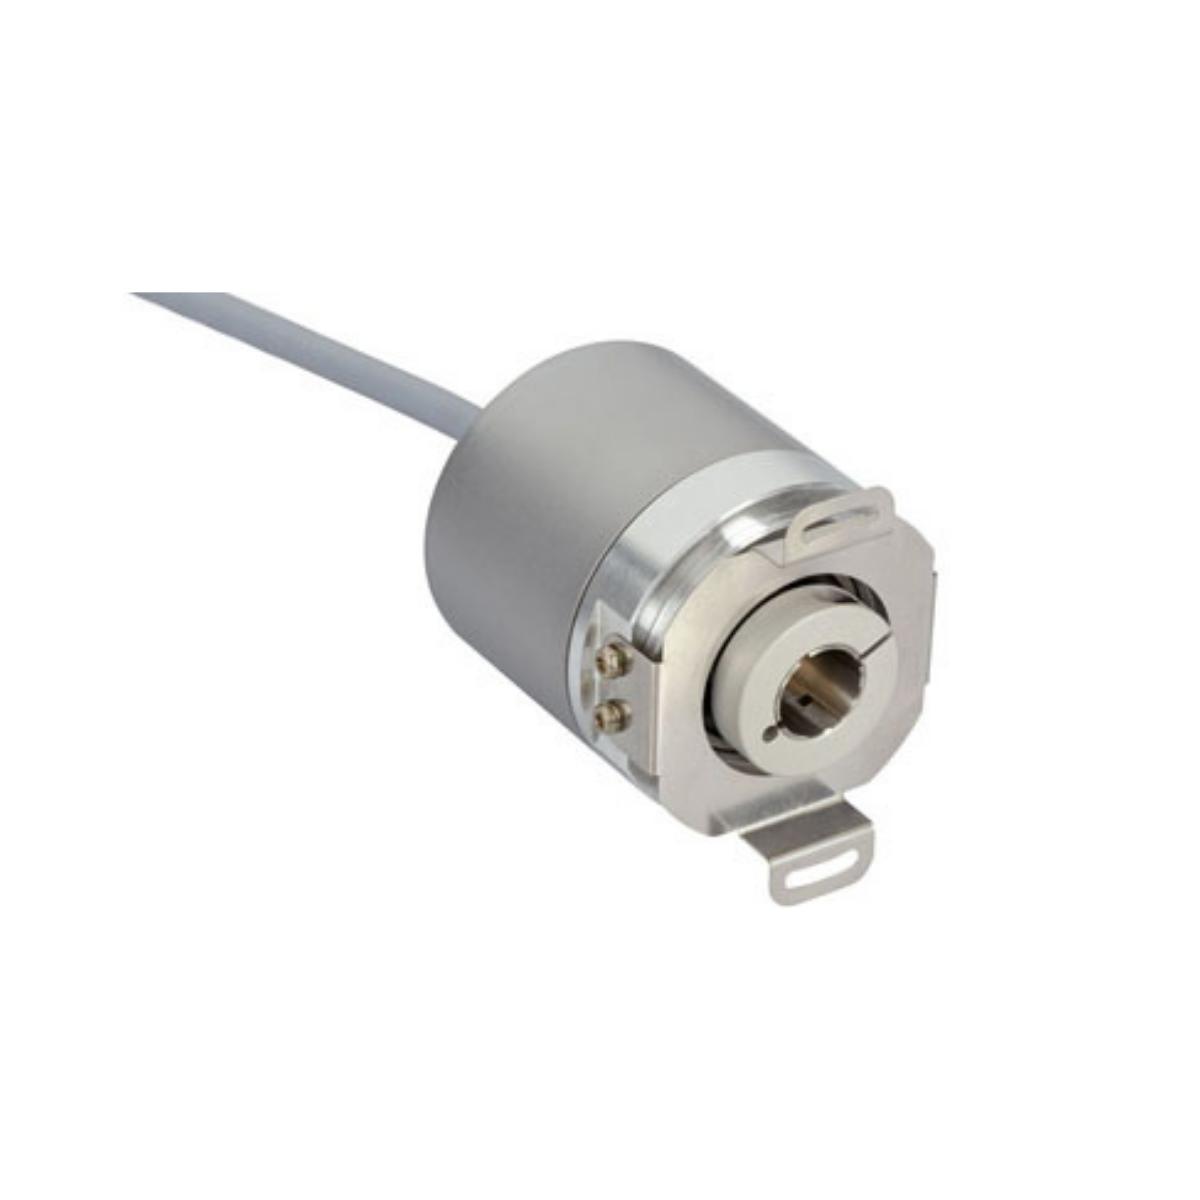 POSITAL UCD-IPH00-01024-HFSS-2AW Blind Hollow Shaft Encoder